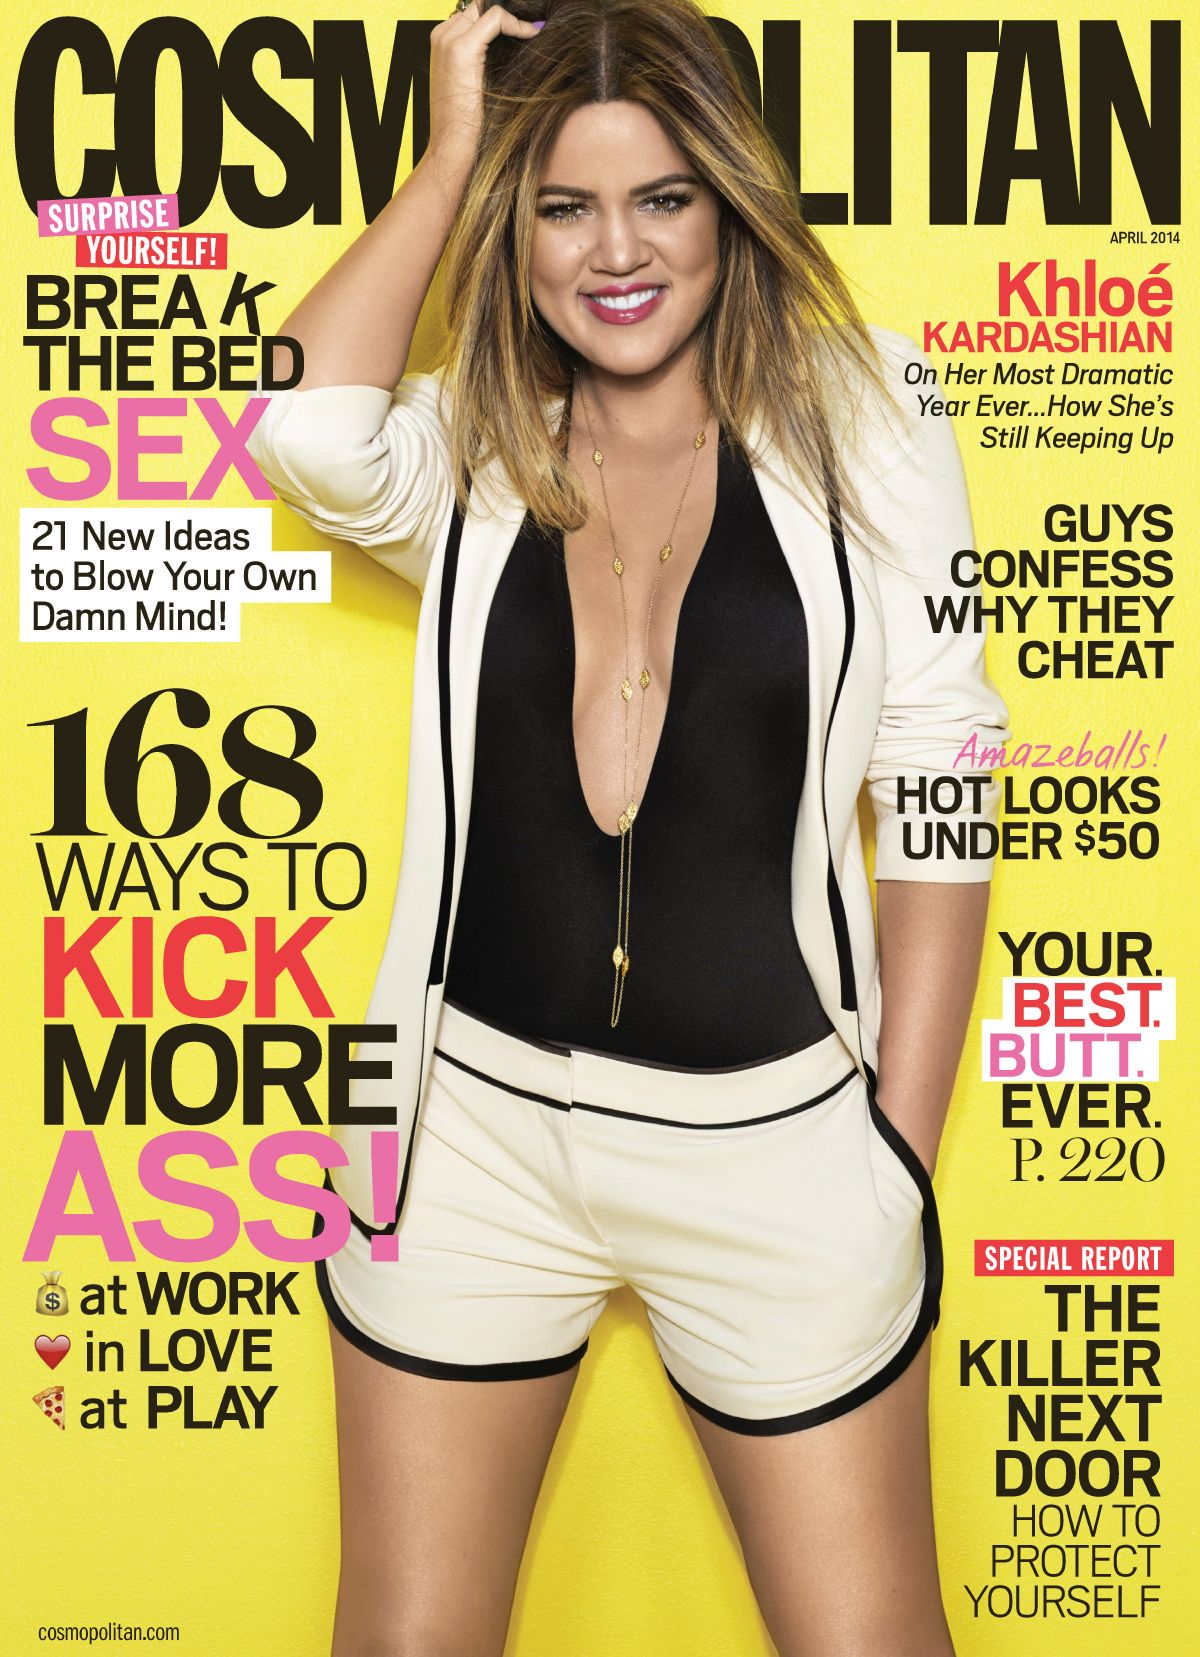 Cosmopolitan Magazine April 2012 Megan Fox on the cover